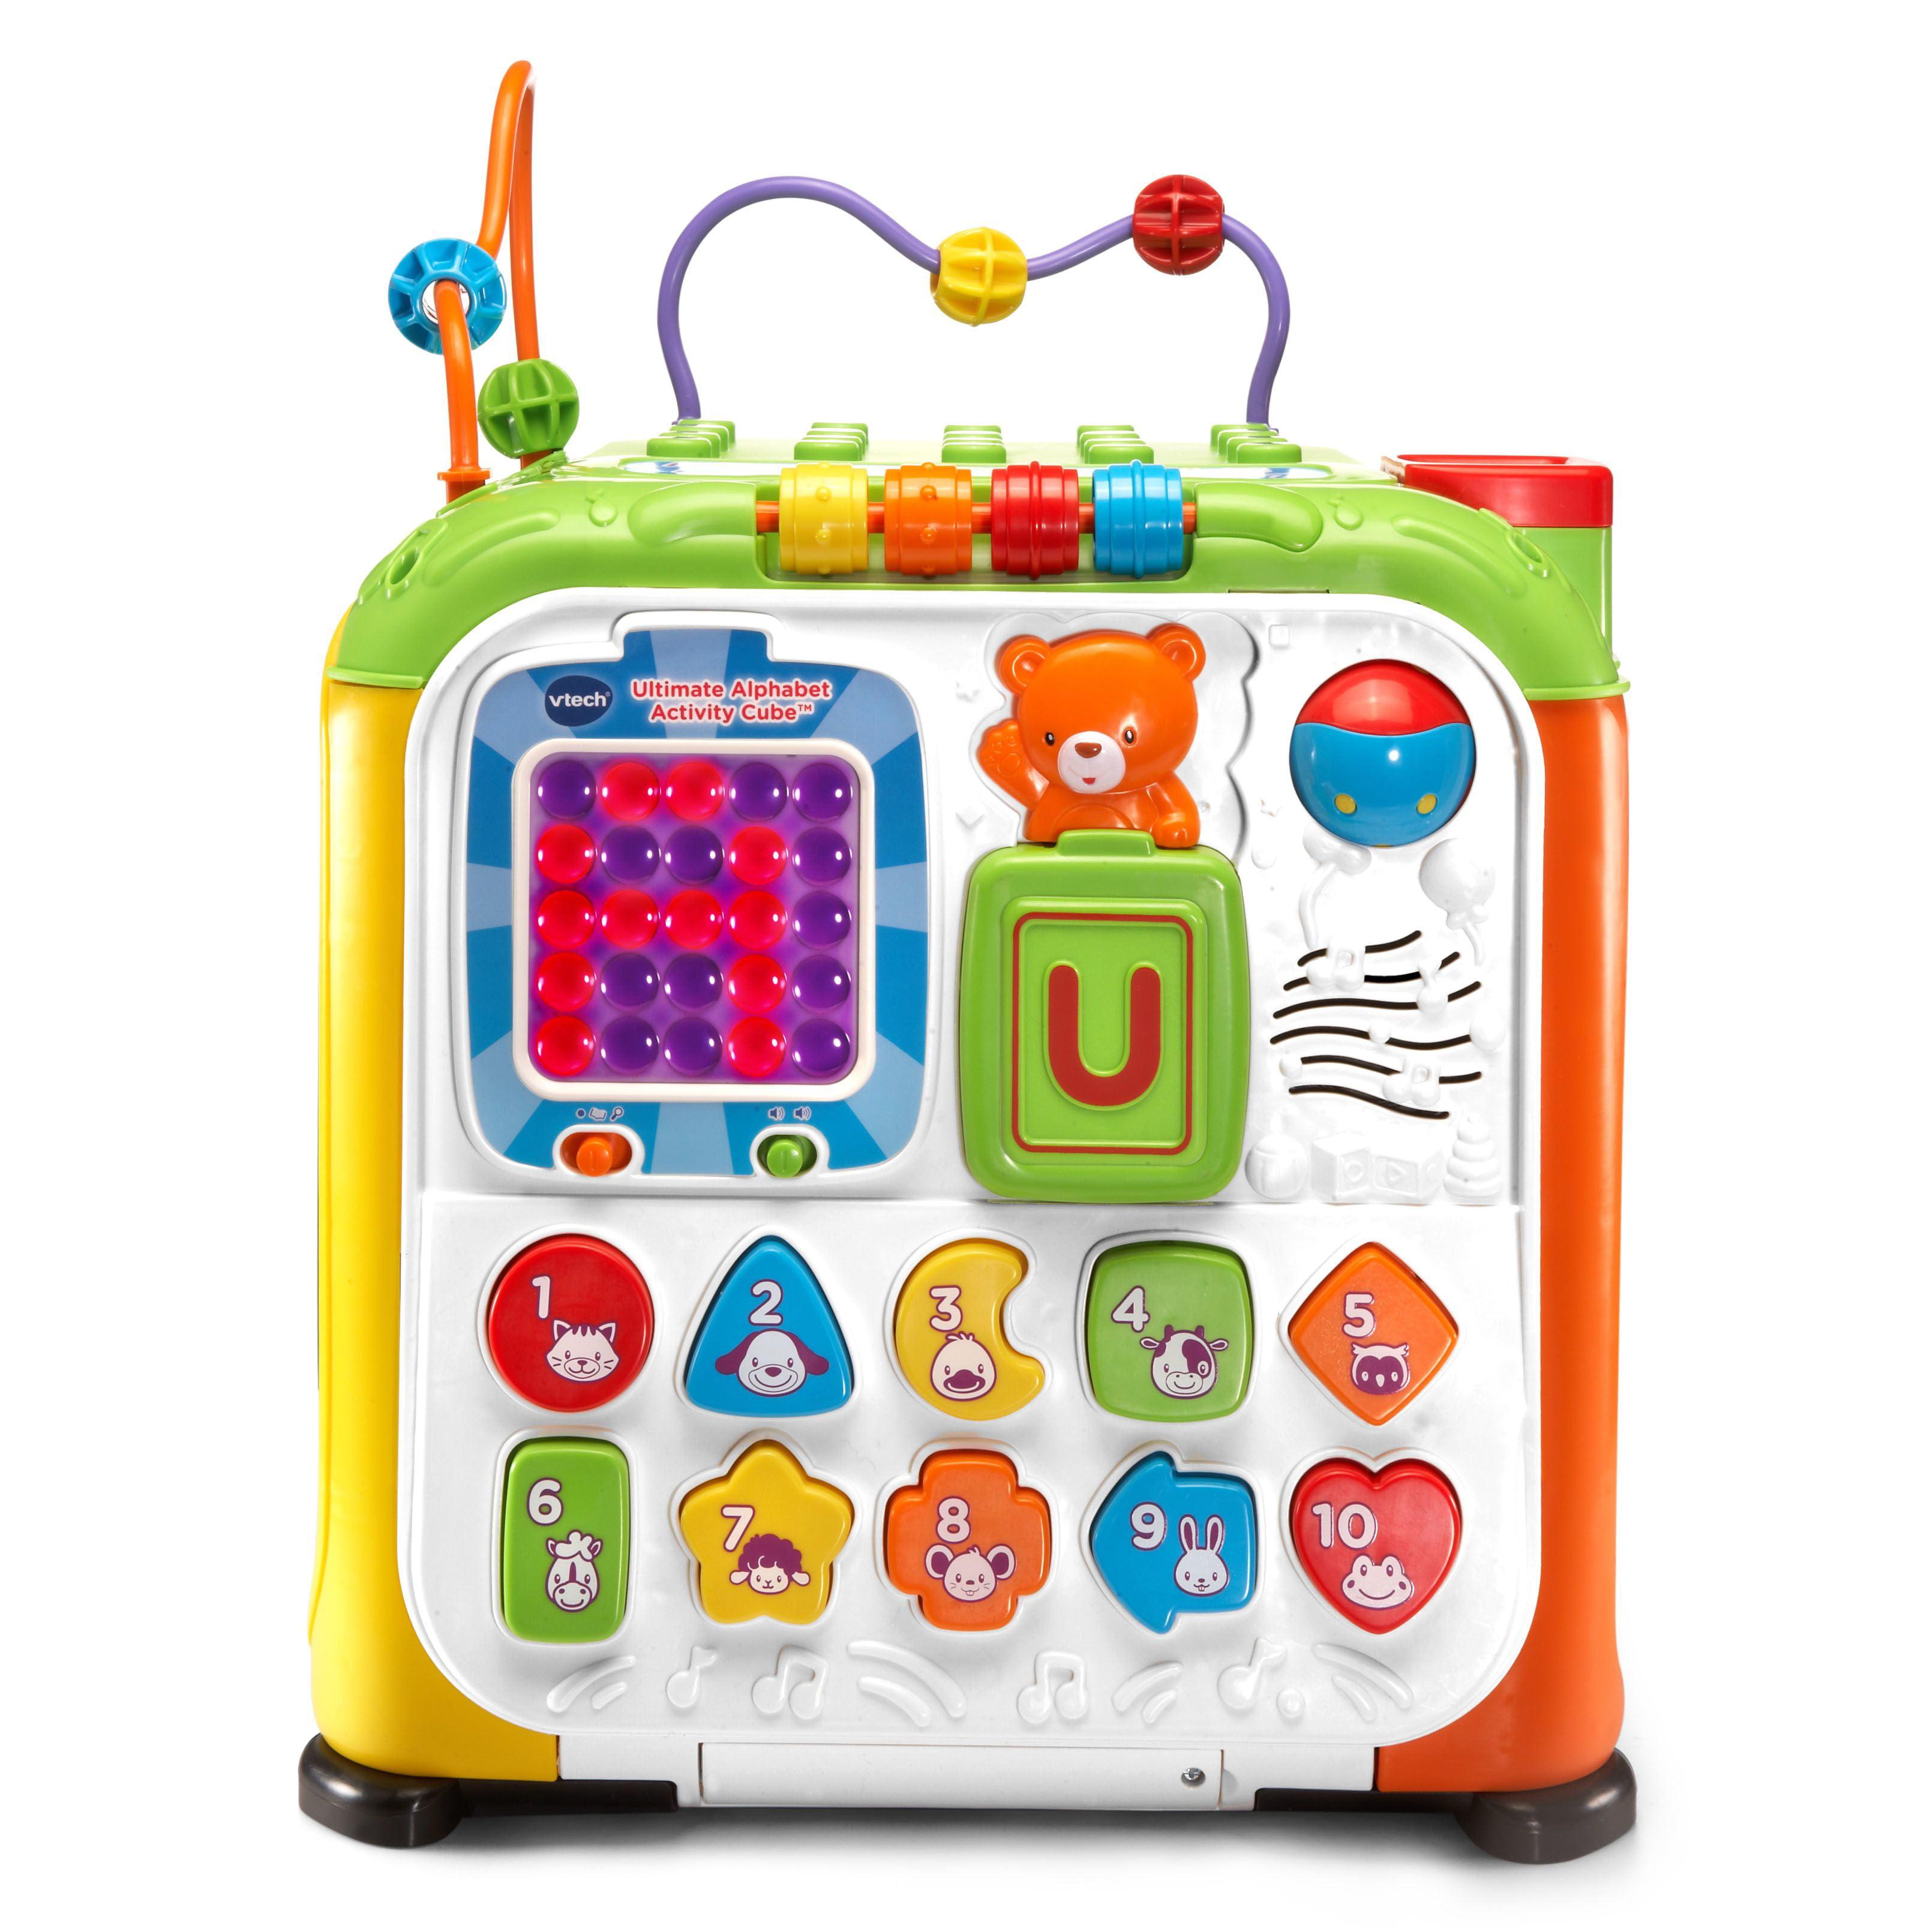 Vtech Ultimate Alphabet Activity Cube Walmartcom